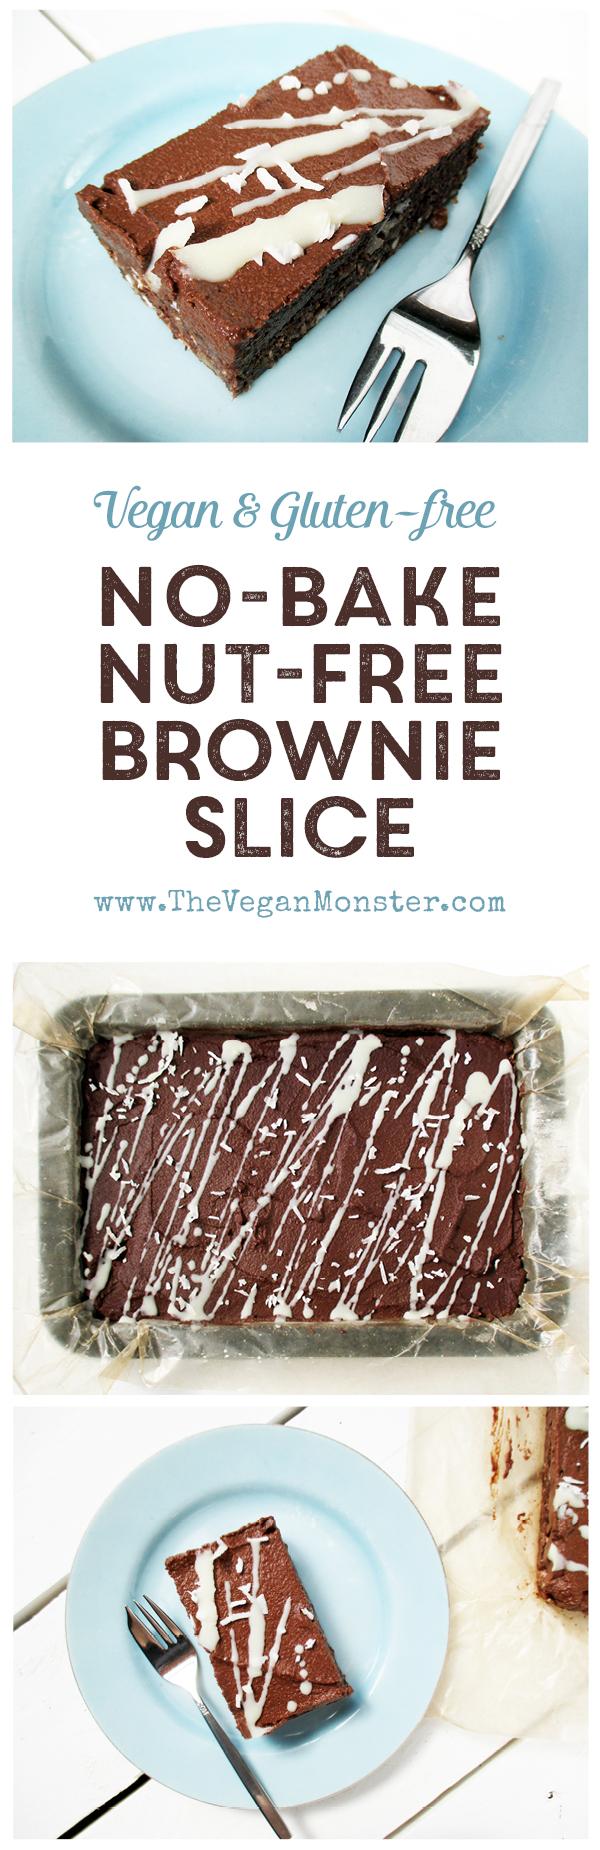 No-Bake Nut-free Gluten-free Vegan Refined Sugar Free Chocolate Brownie Slice Recipe